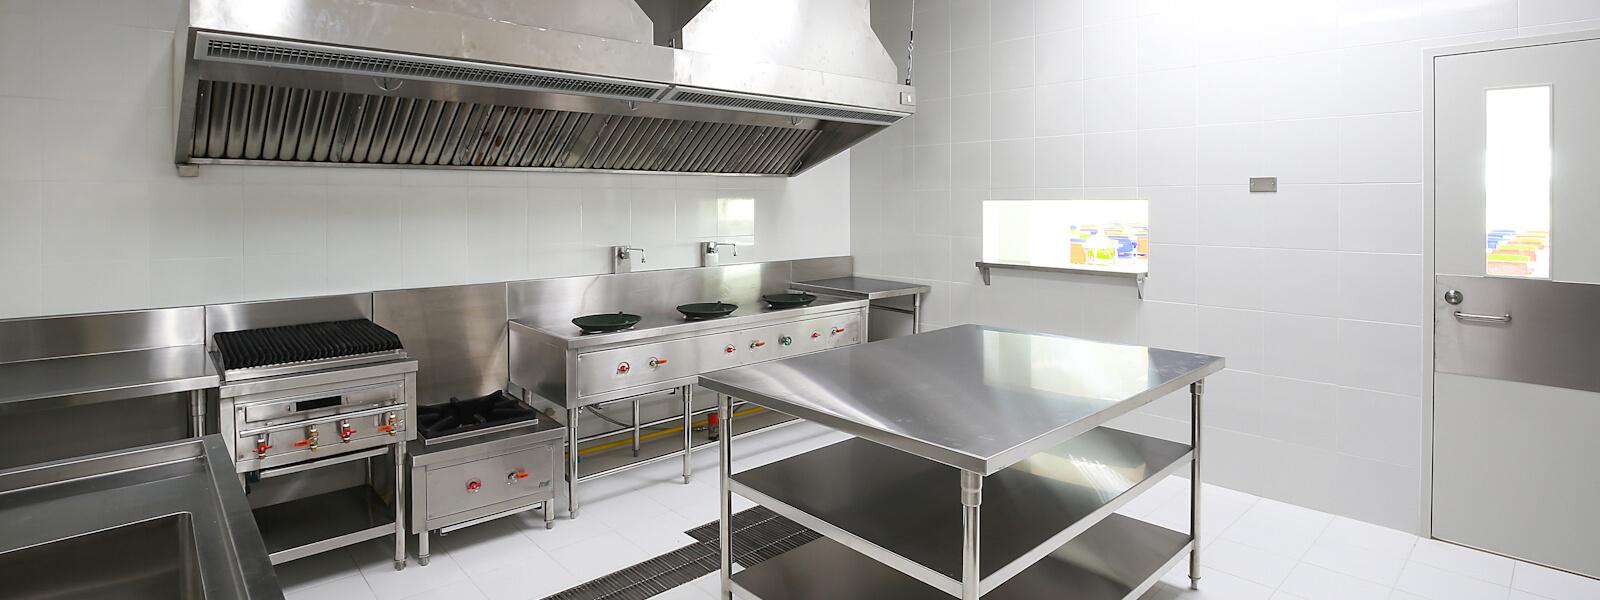 Kitchen Deep Cleans